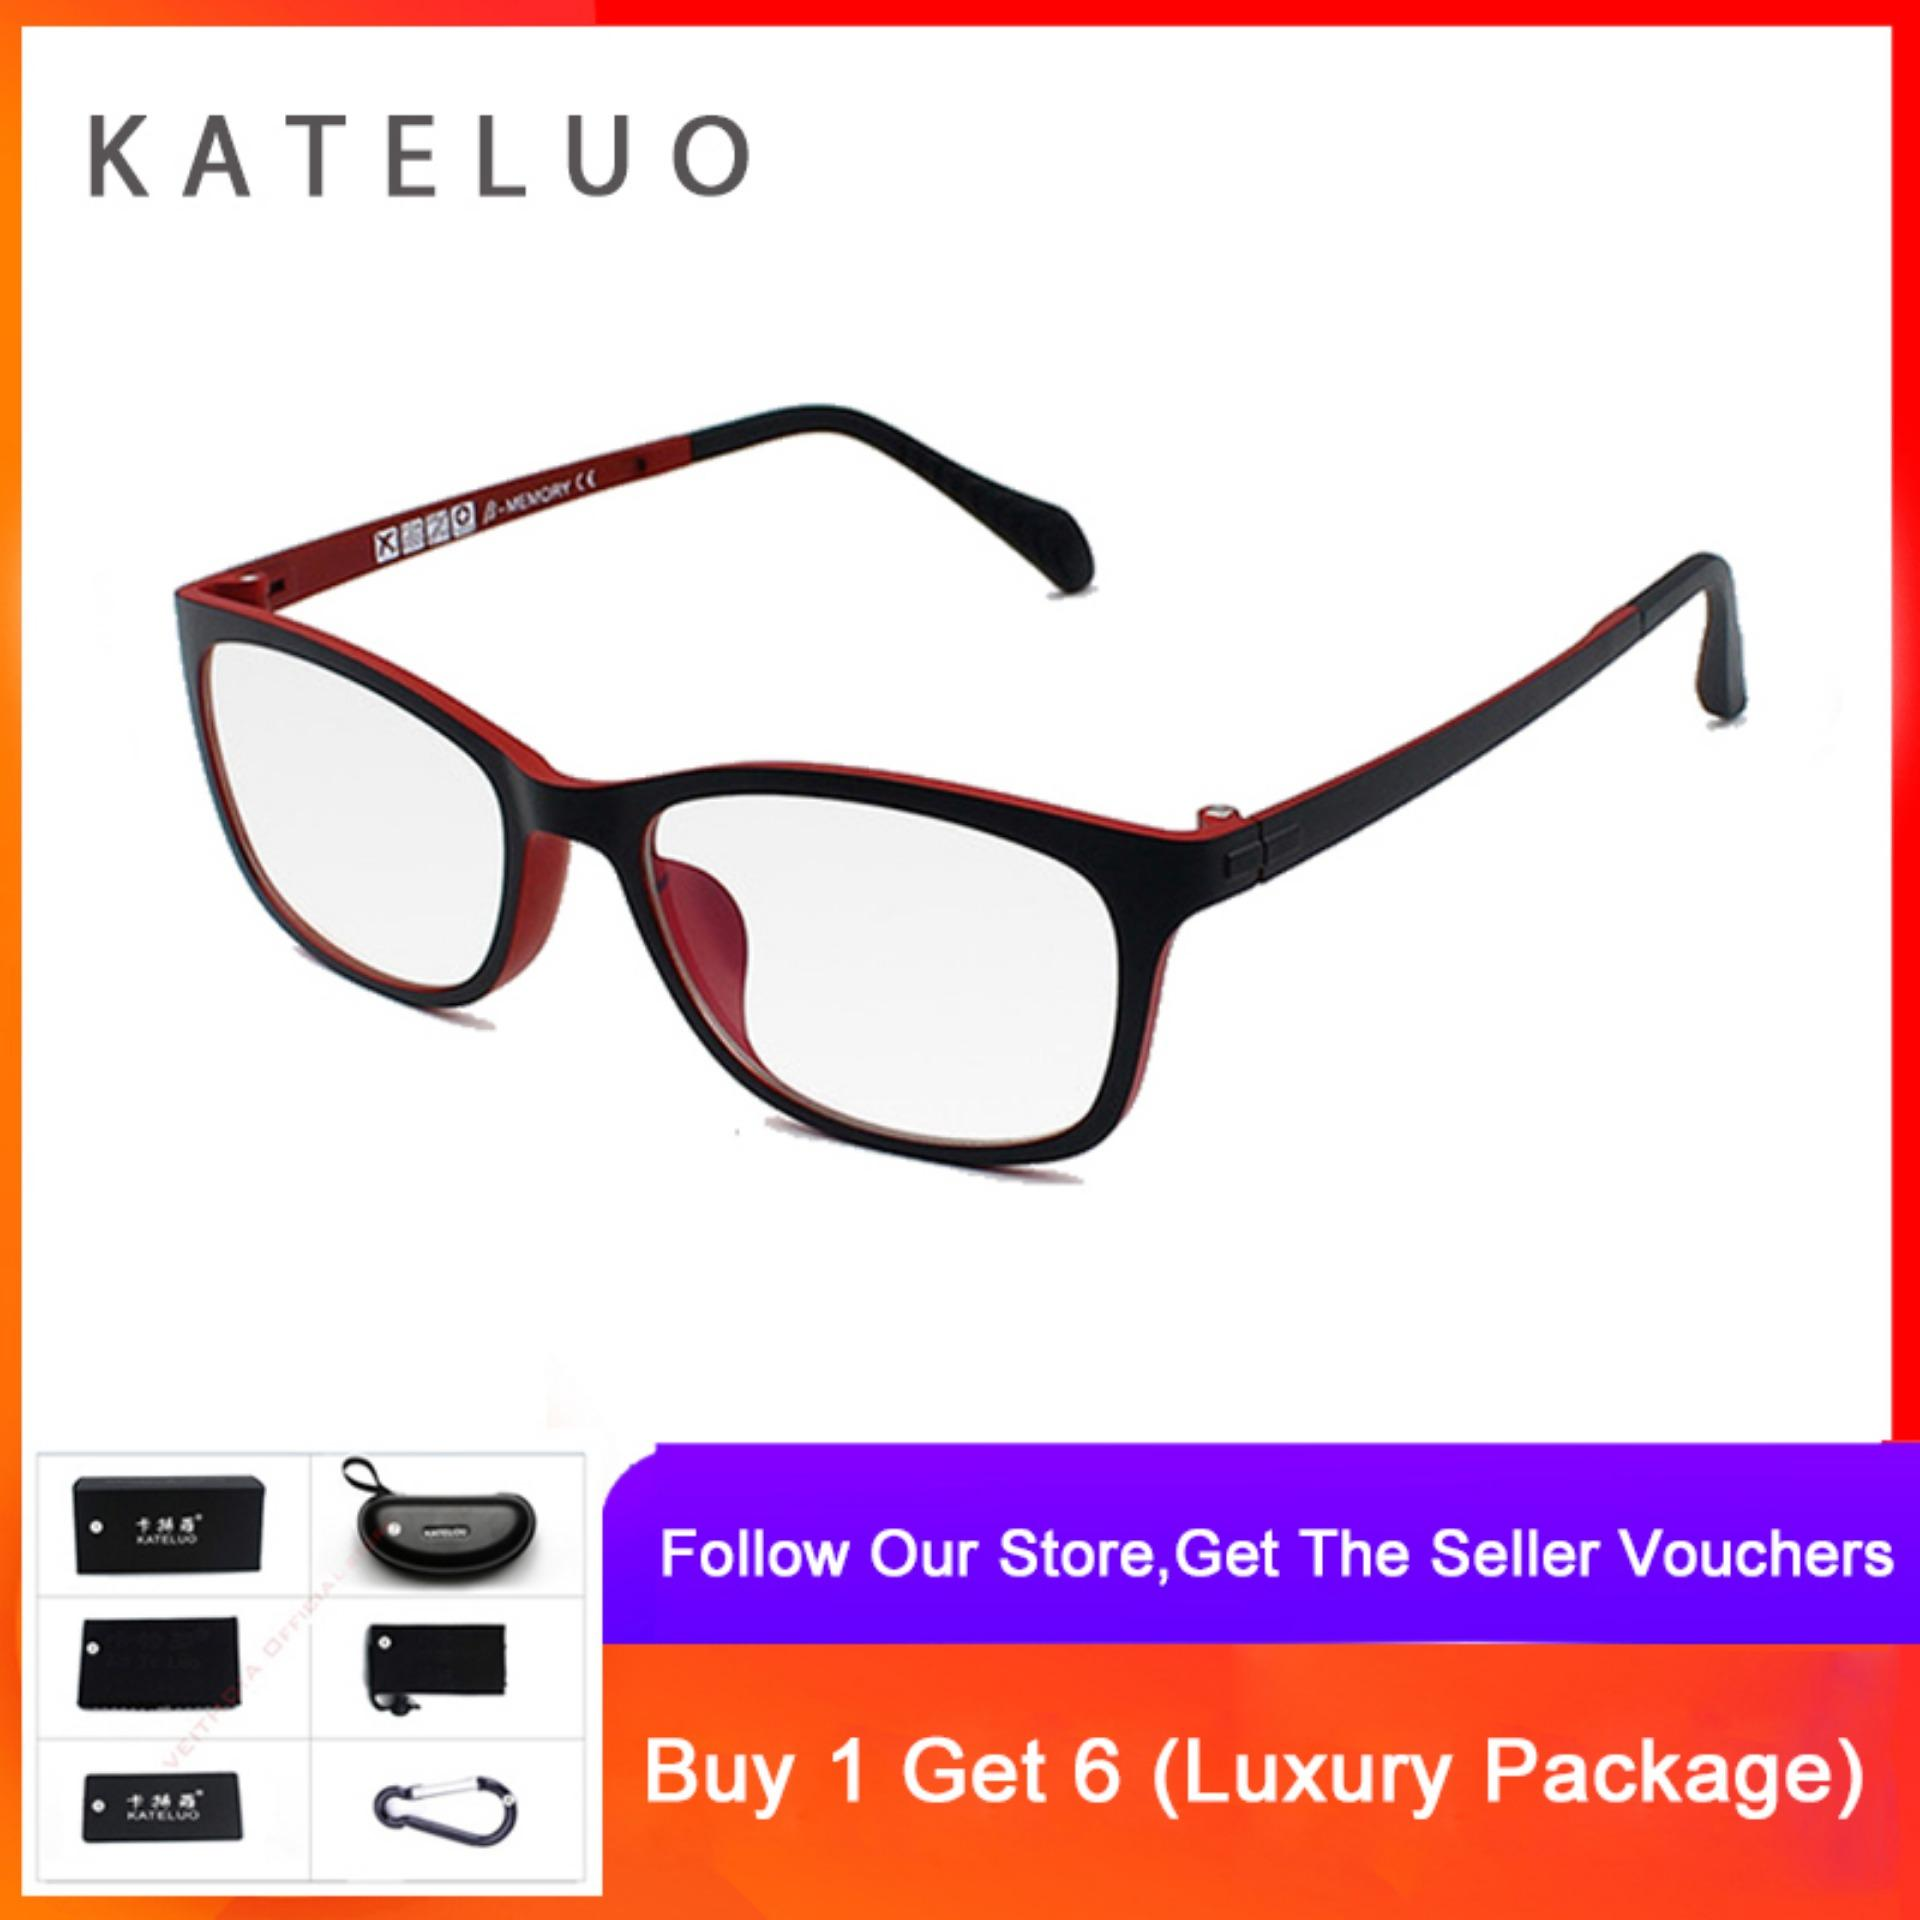 Cod+pengiriman Gratis Kateluo Komputer Kacamata Anti Laser Kelelahan Radiasi-Tahan Kacamata Bingkai Kacamata 13031 By Veithdia Official Store.